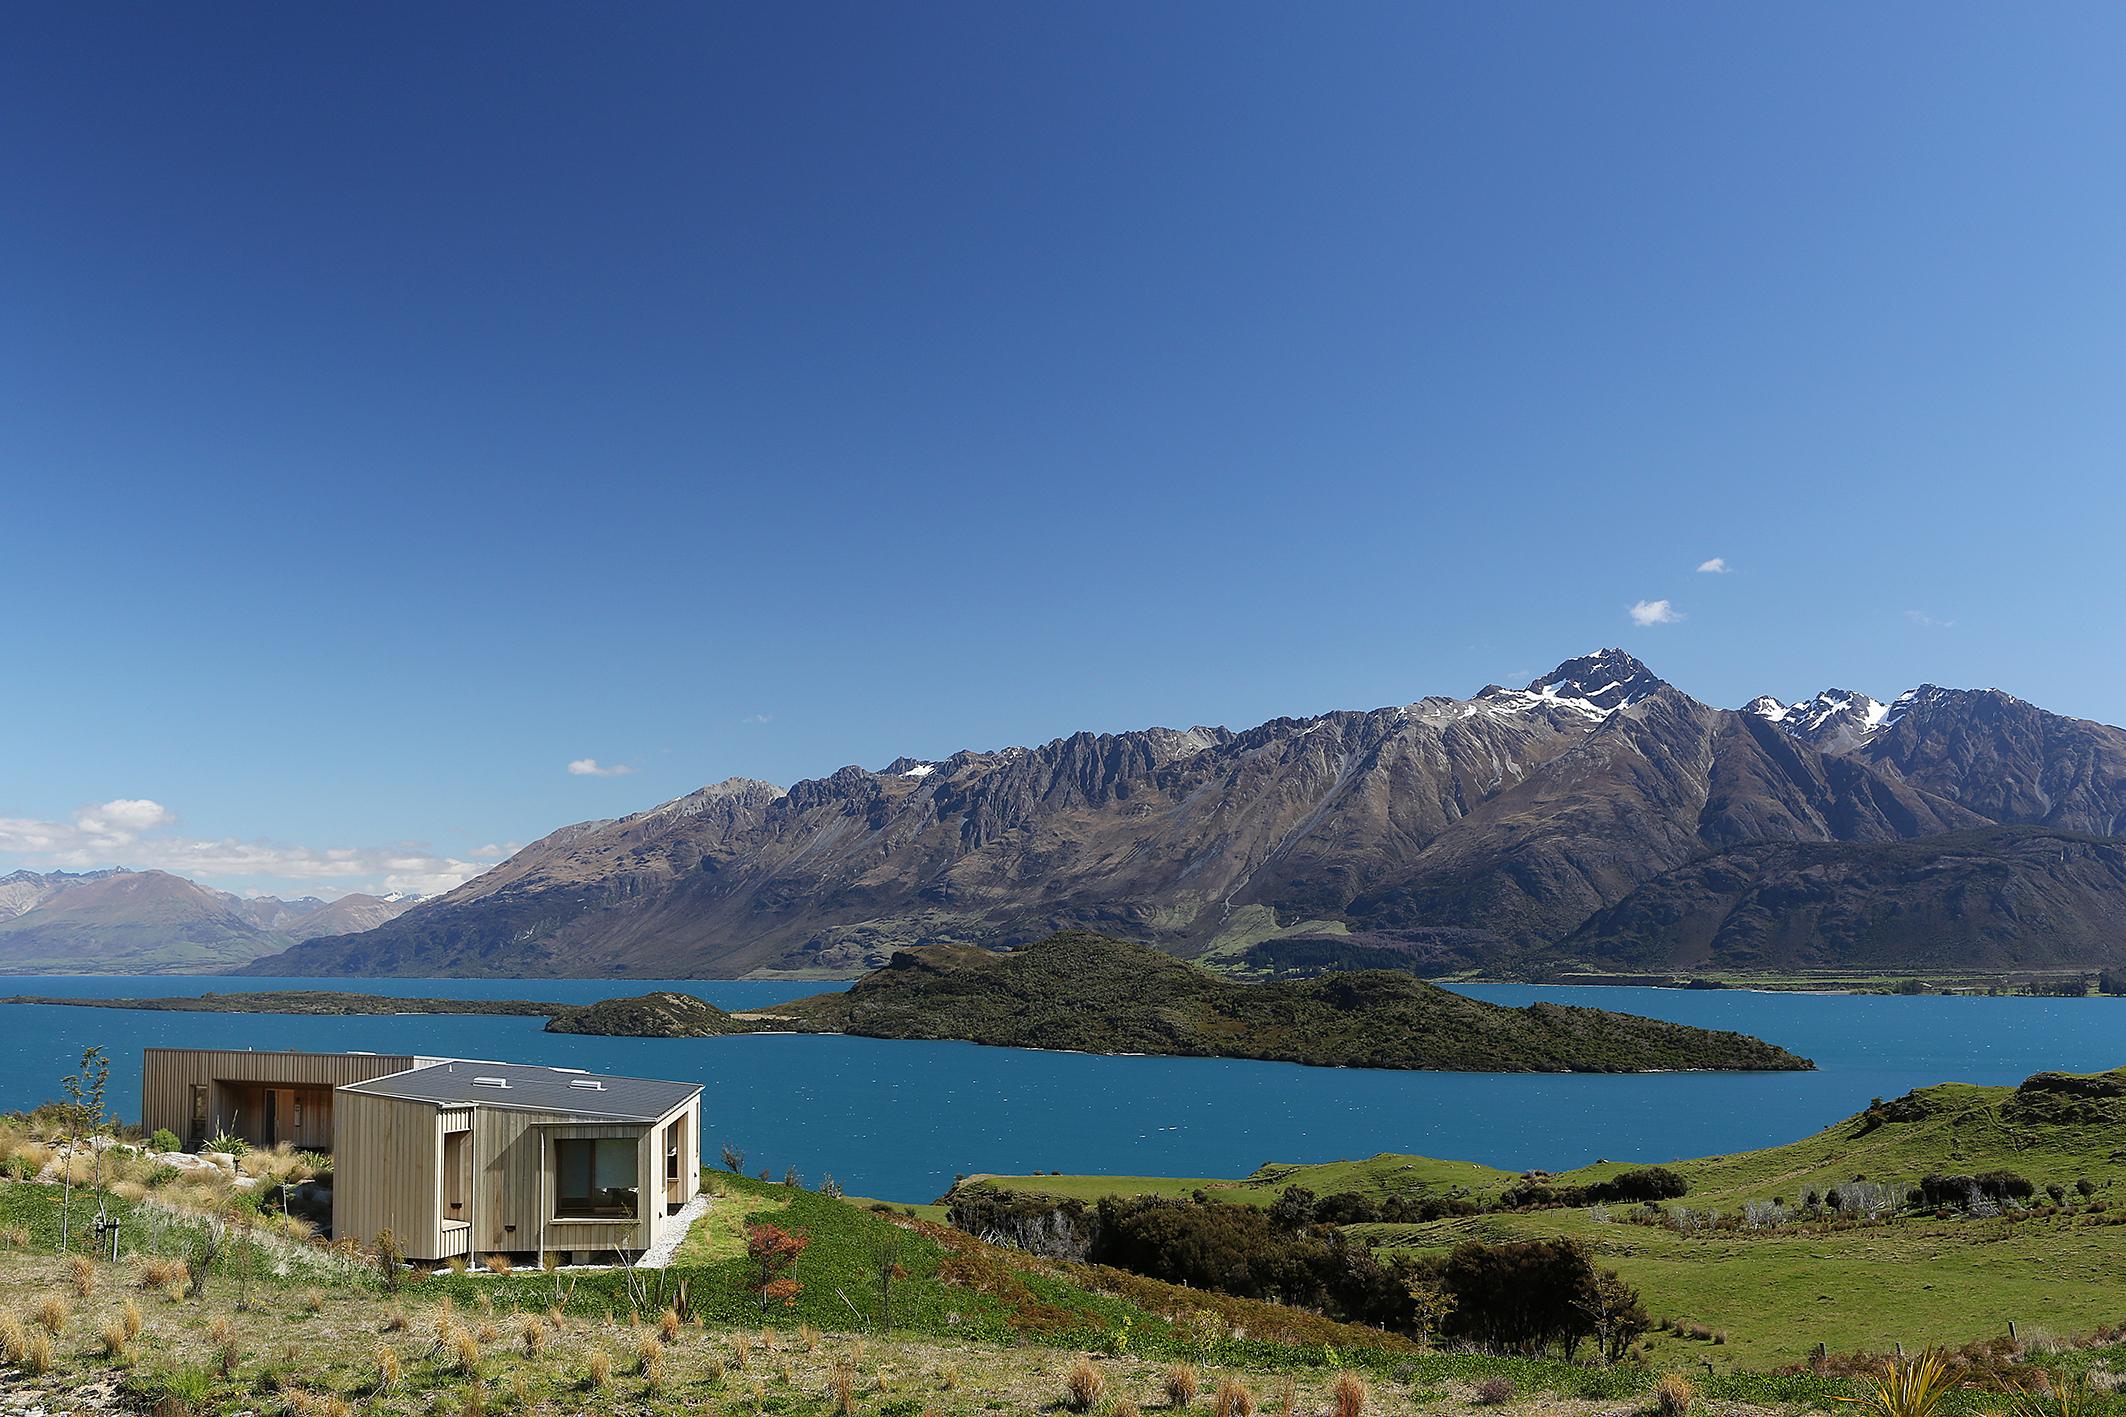 InBedWith_RhiannonTaylor_AroHa_review_newzealand2